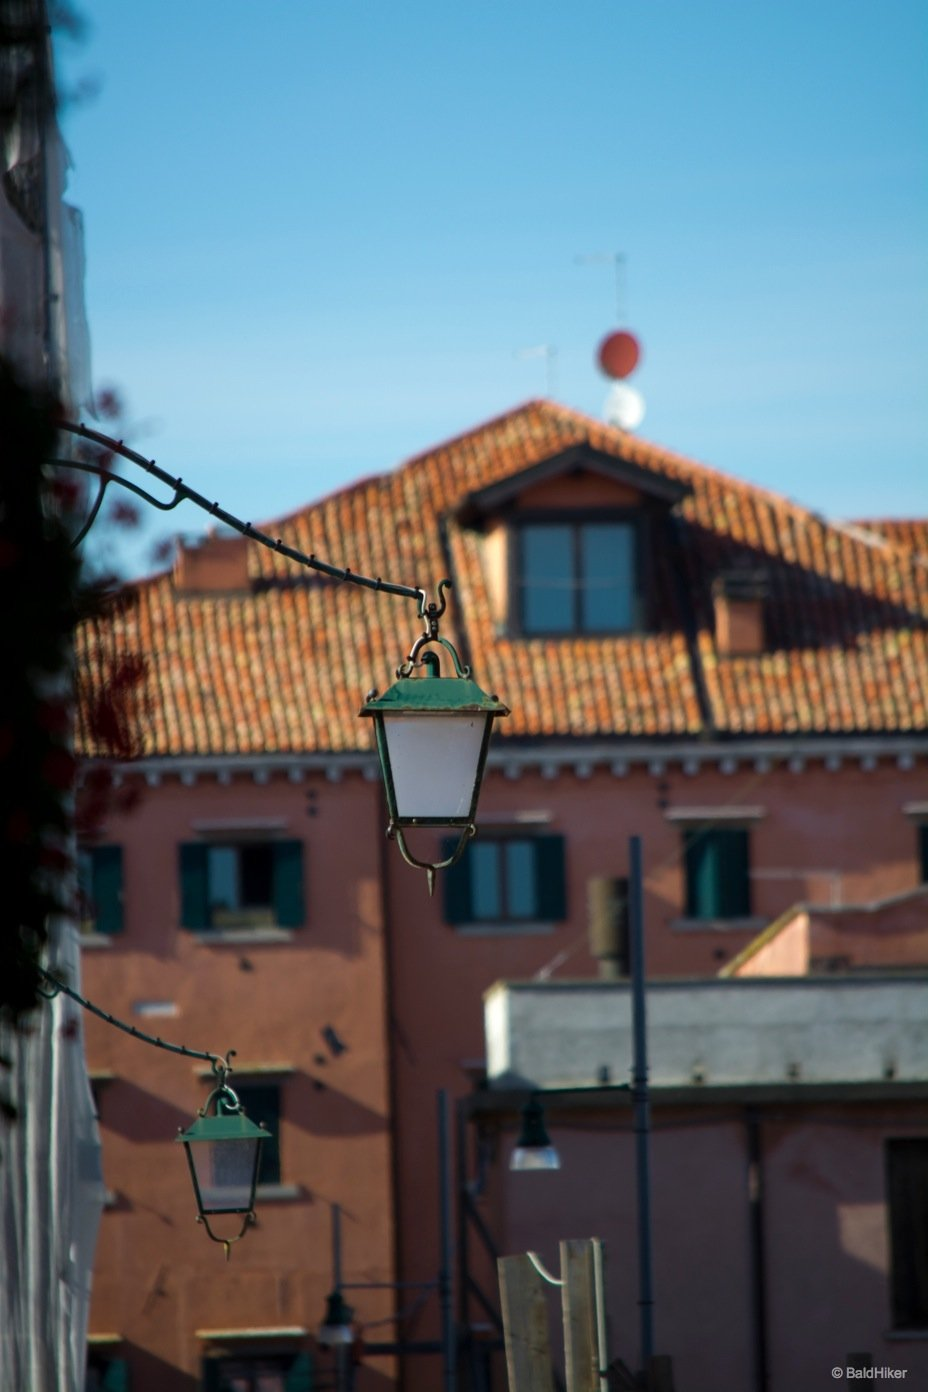 DSC_1287_venice_streets Street scenes of Giudecca, Venice